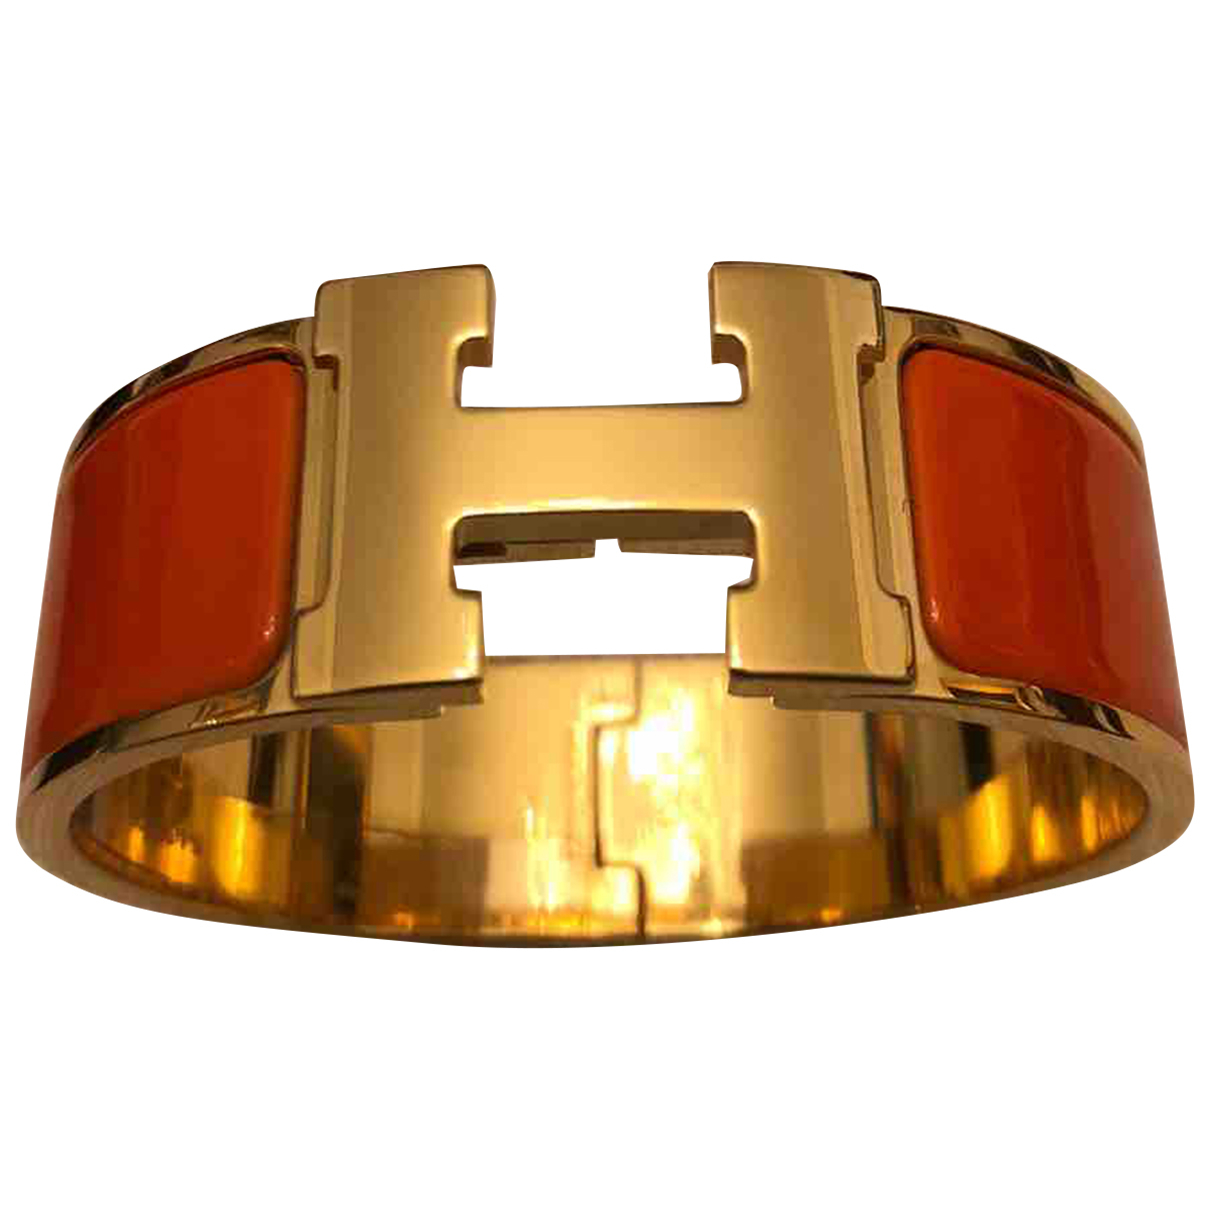 Hermes Clic H Armband in  Orange Stahl